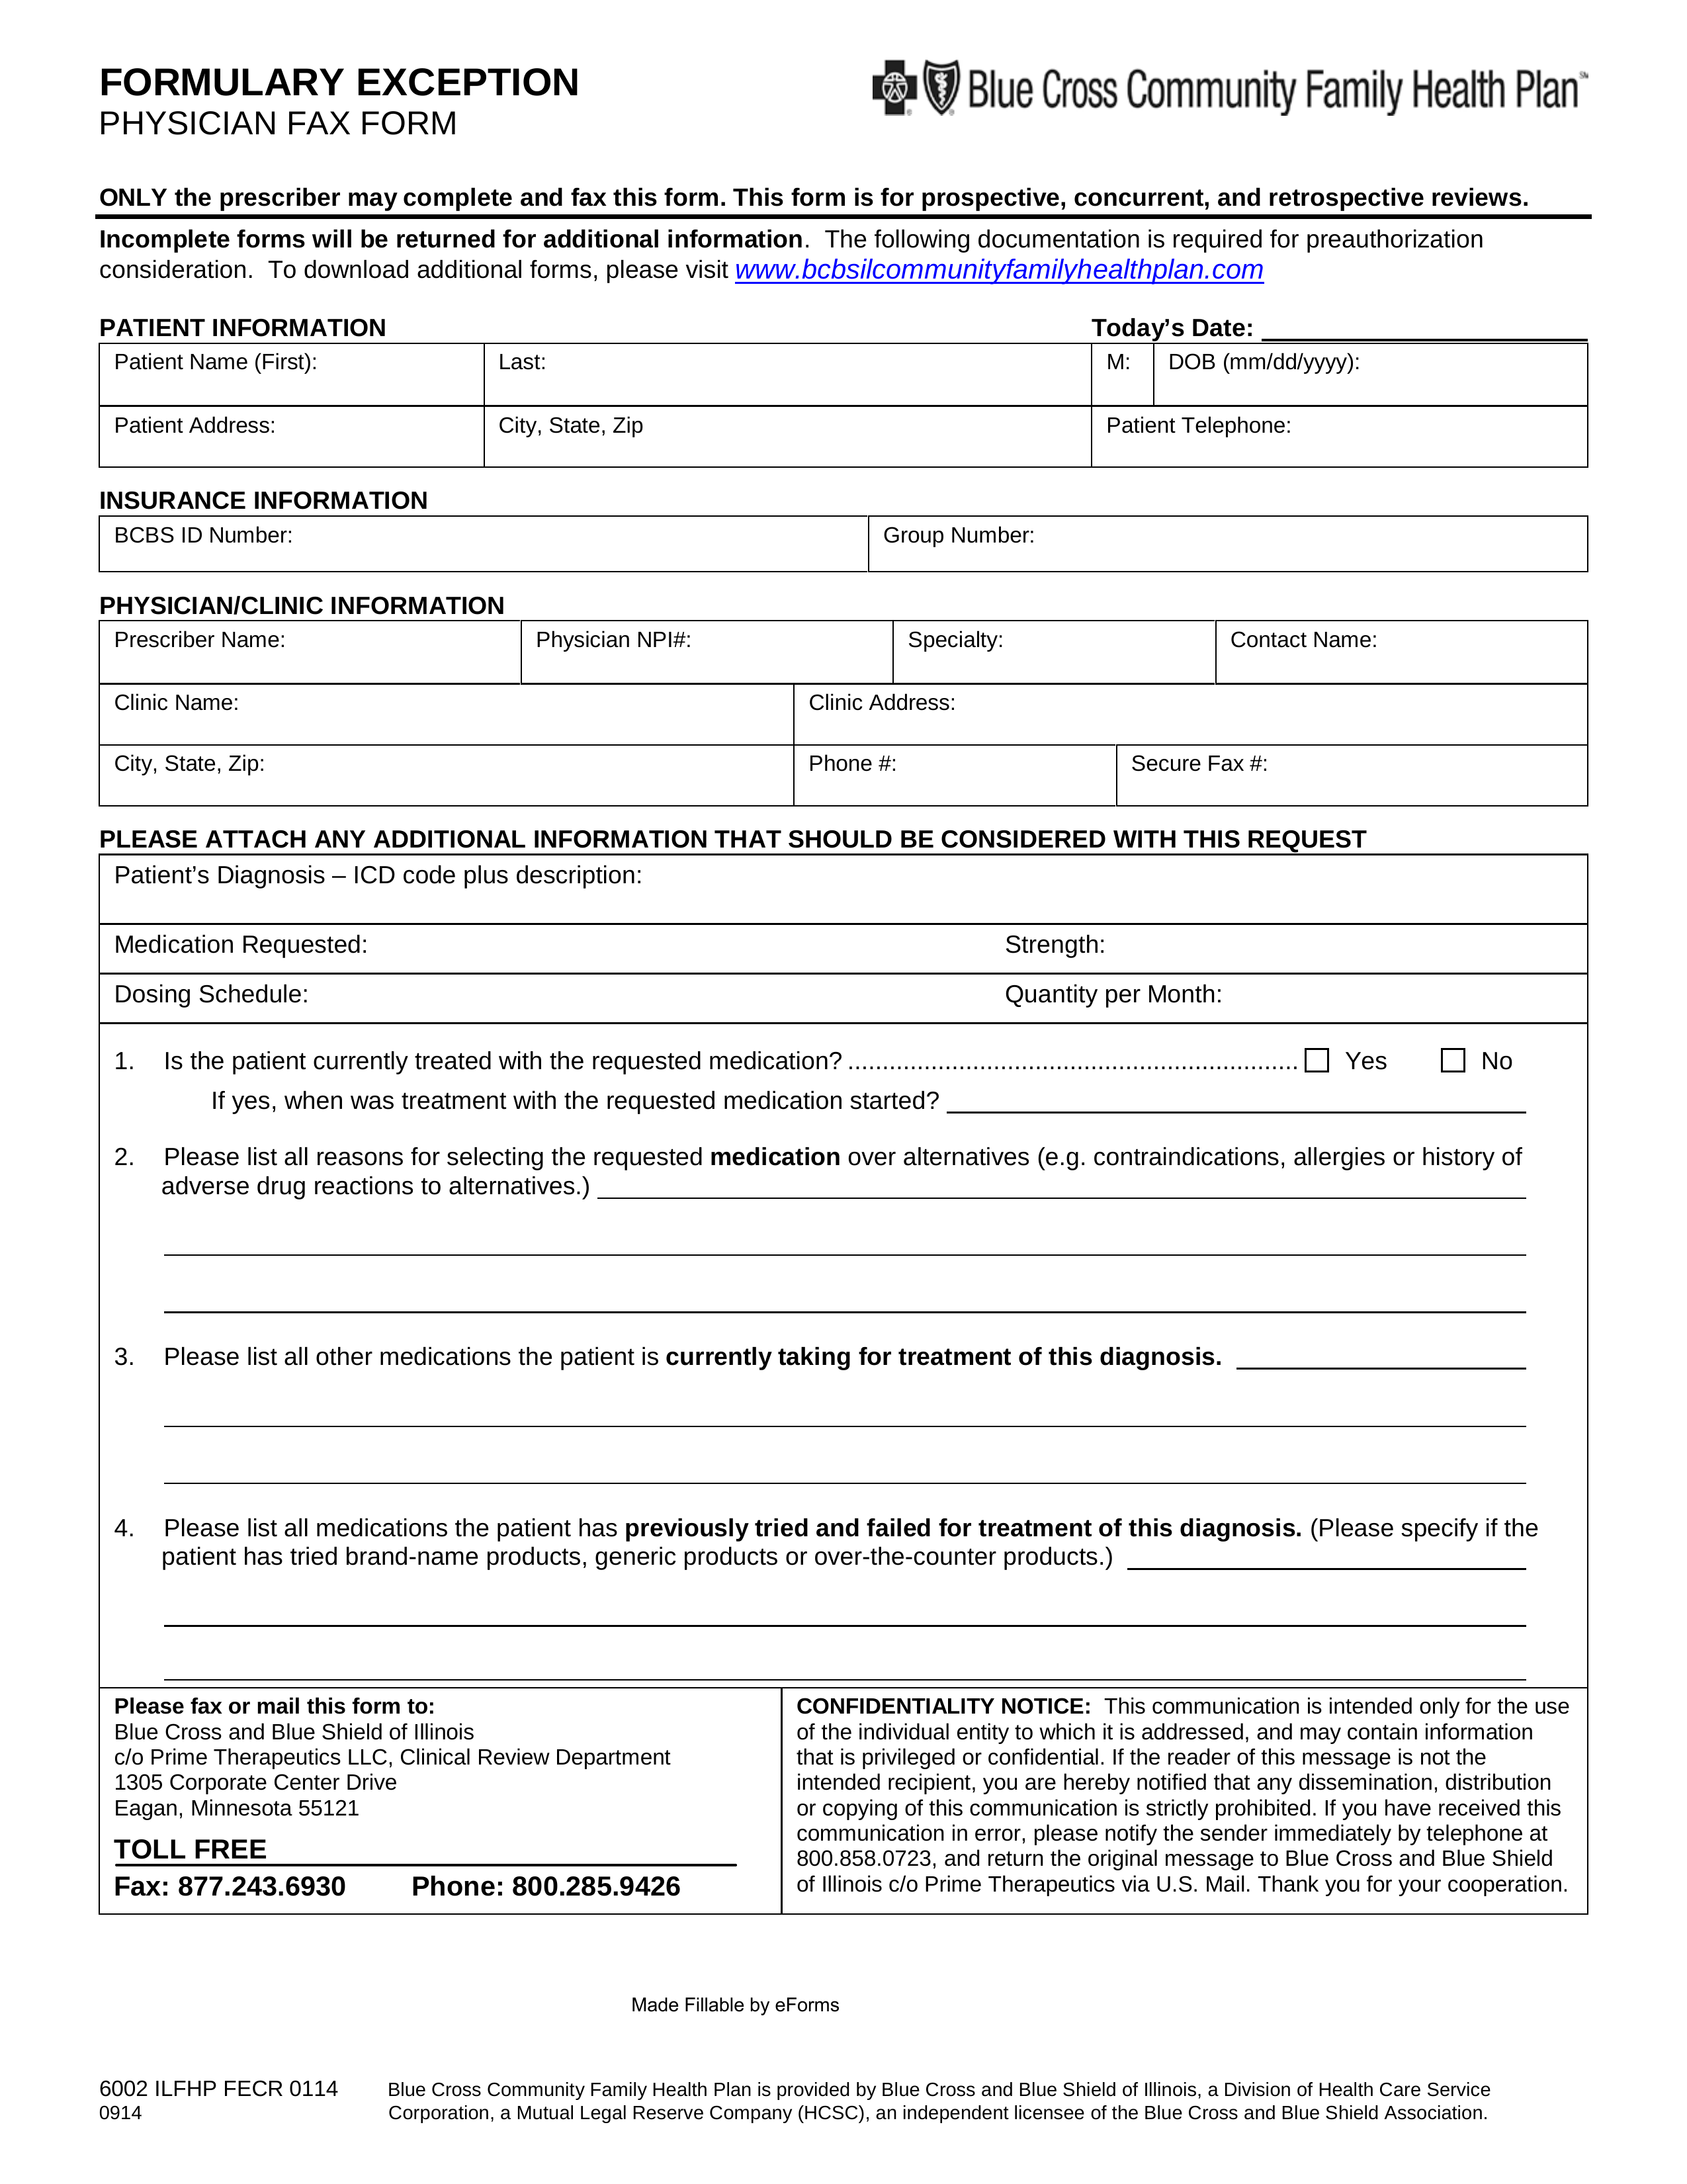 Free Prime Therapeutics Prior (Rx) Authorization Form - PDF